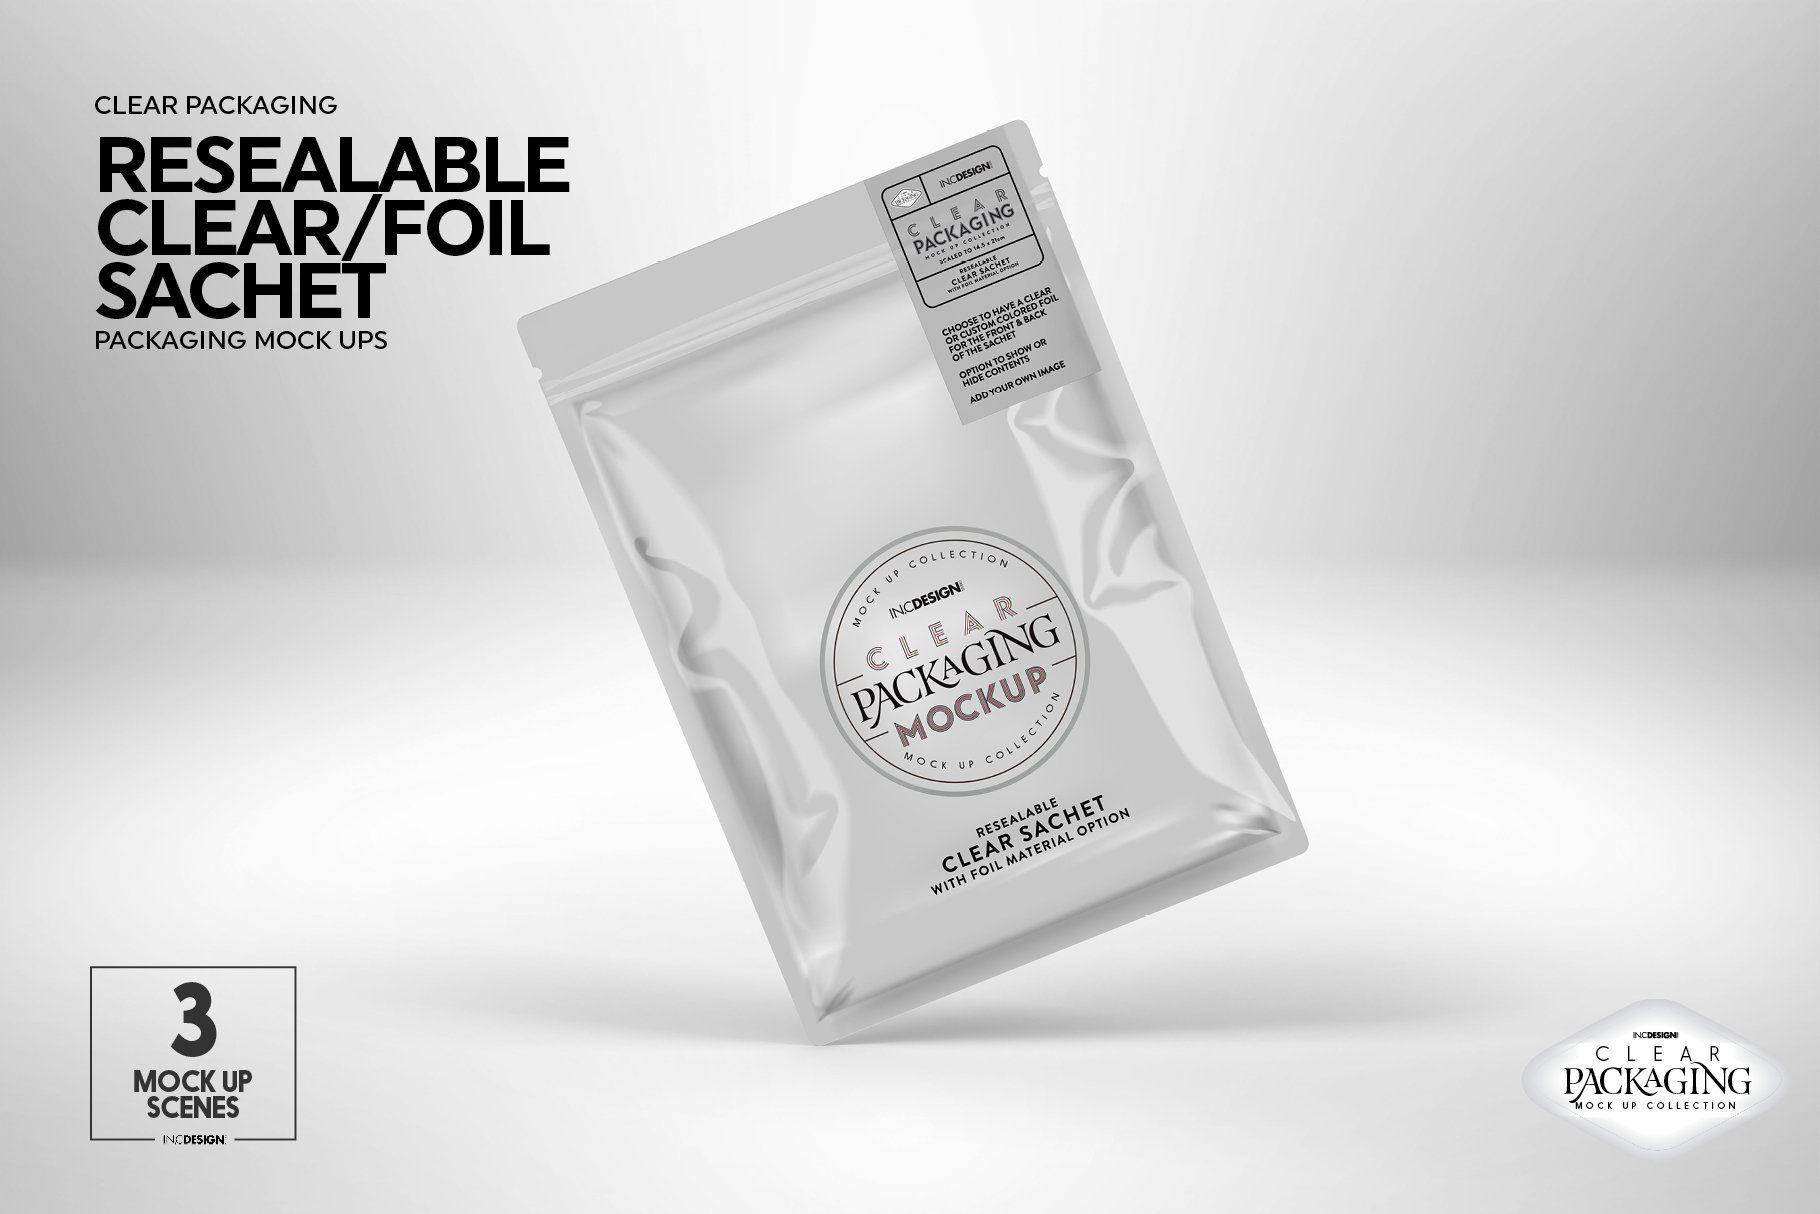 Clear Foil Sachet Packaging Mockup Packaging Mockup Branding